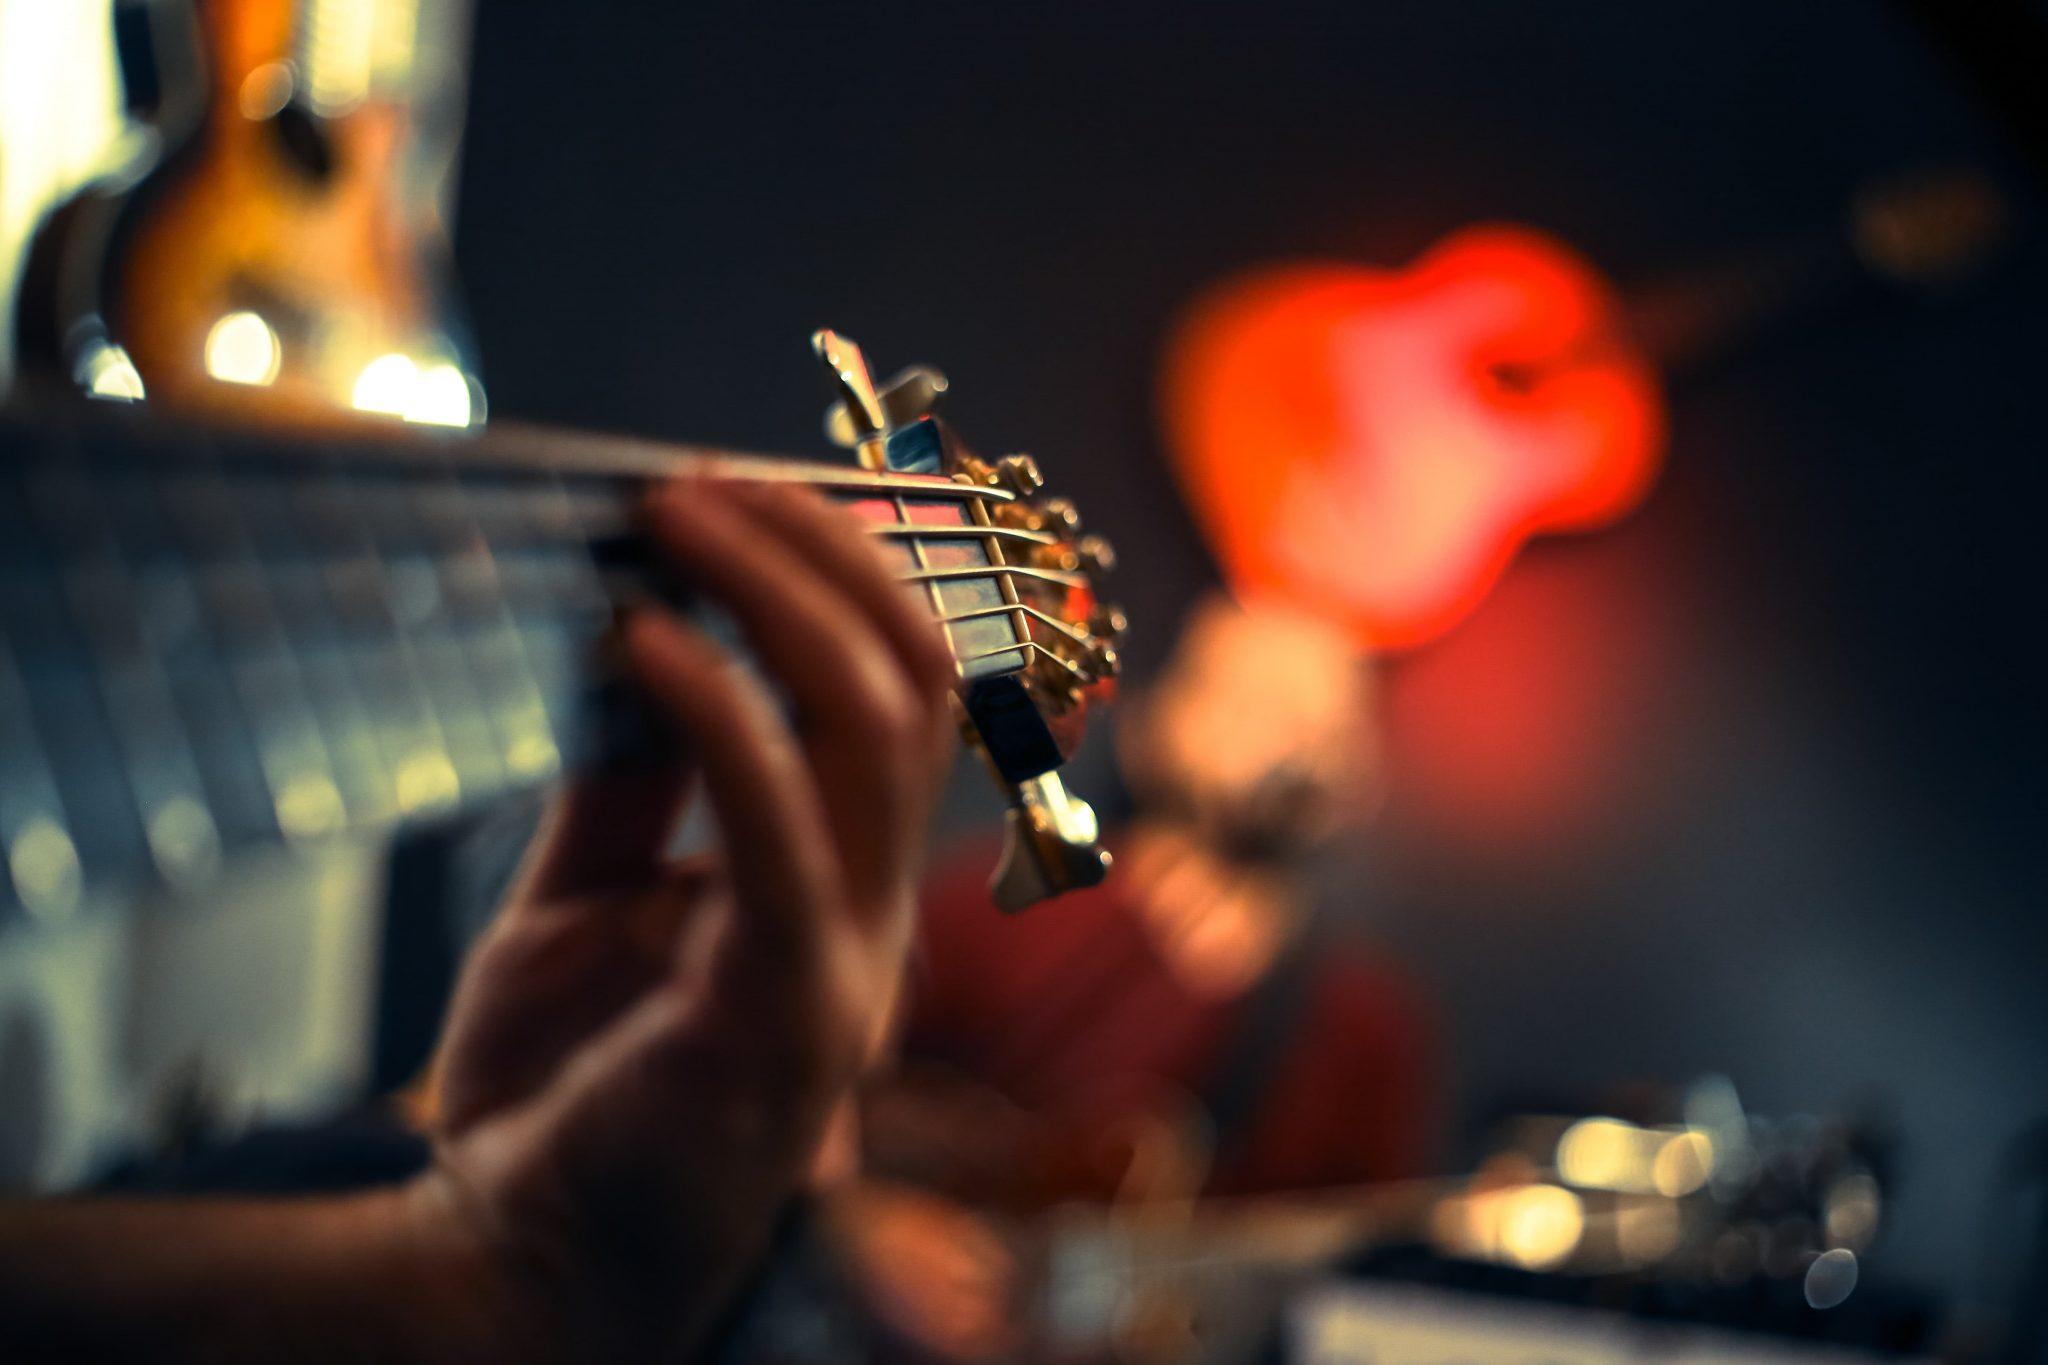 guitarist's fretting hand on guitar fretboard